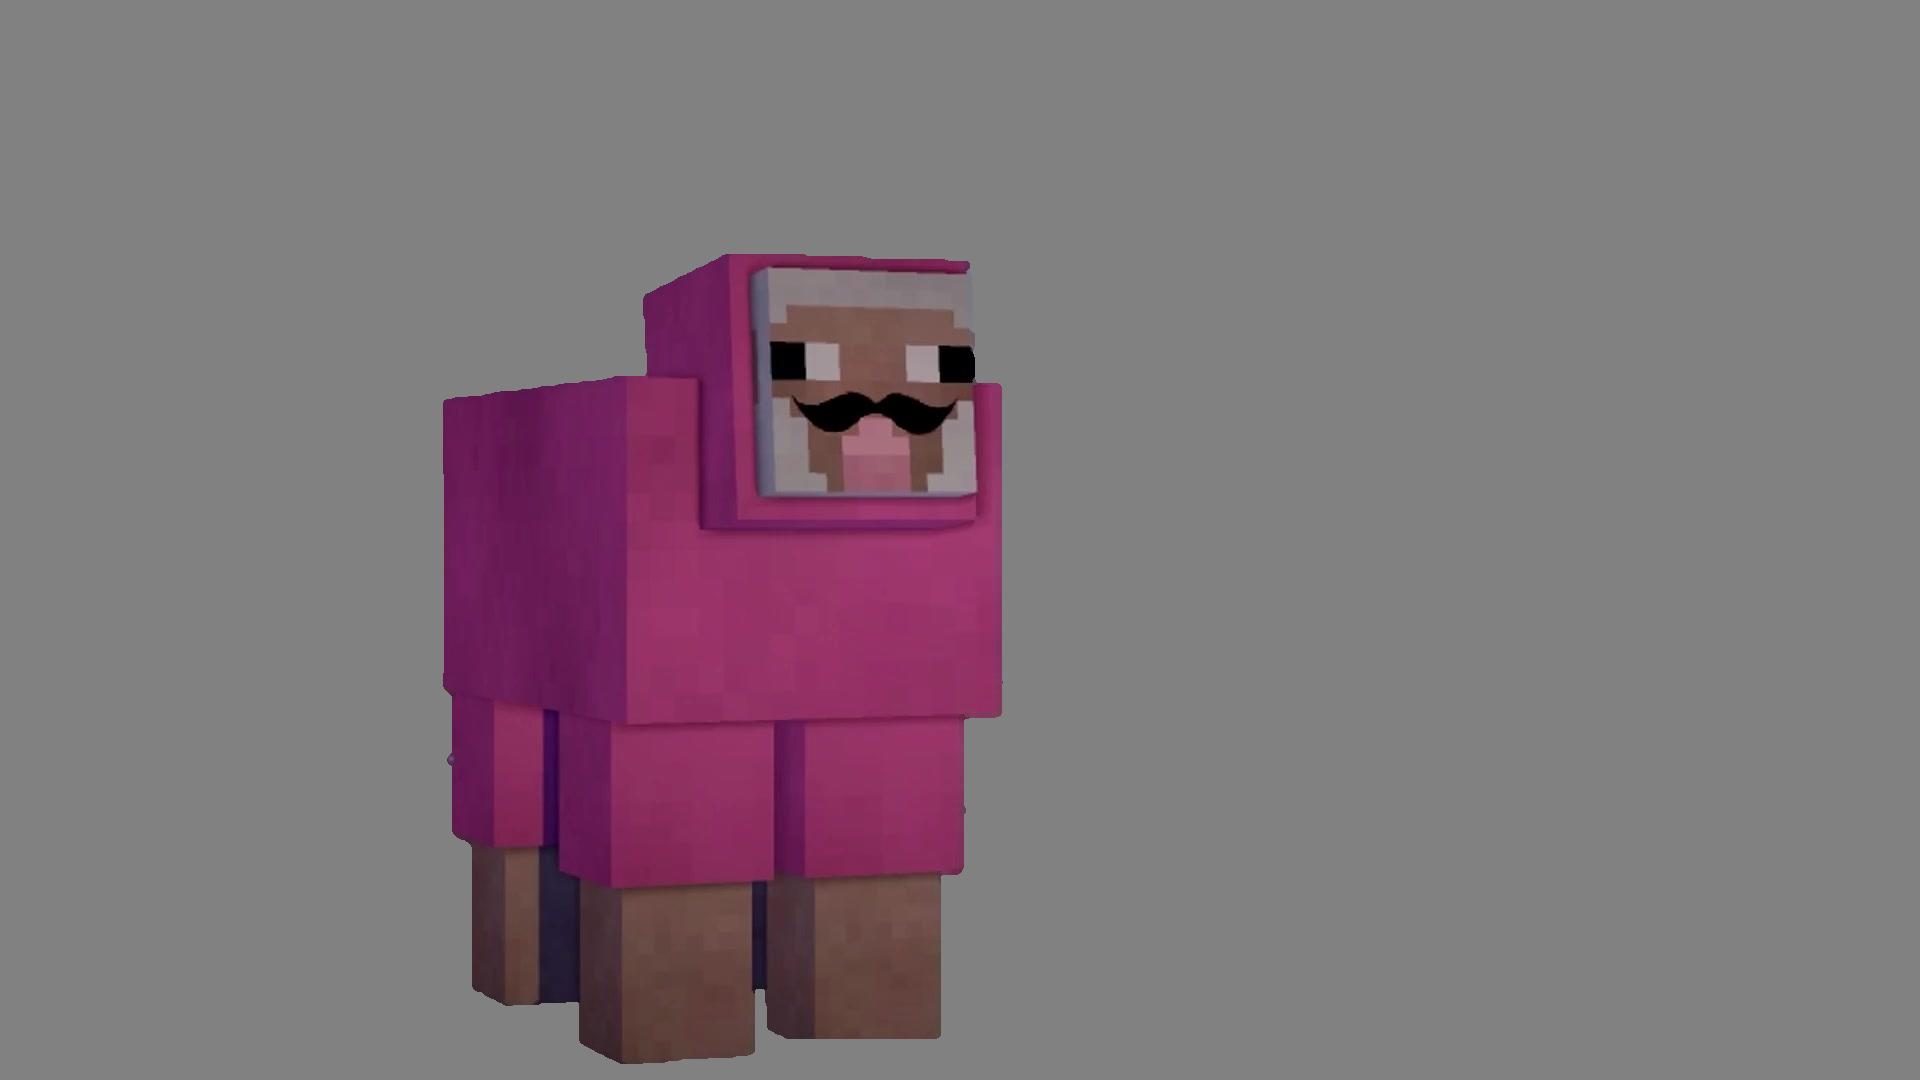 Pink Sheep Explodingtnt